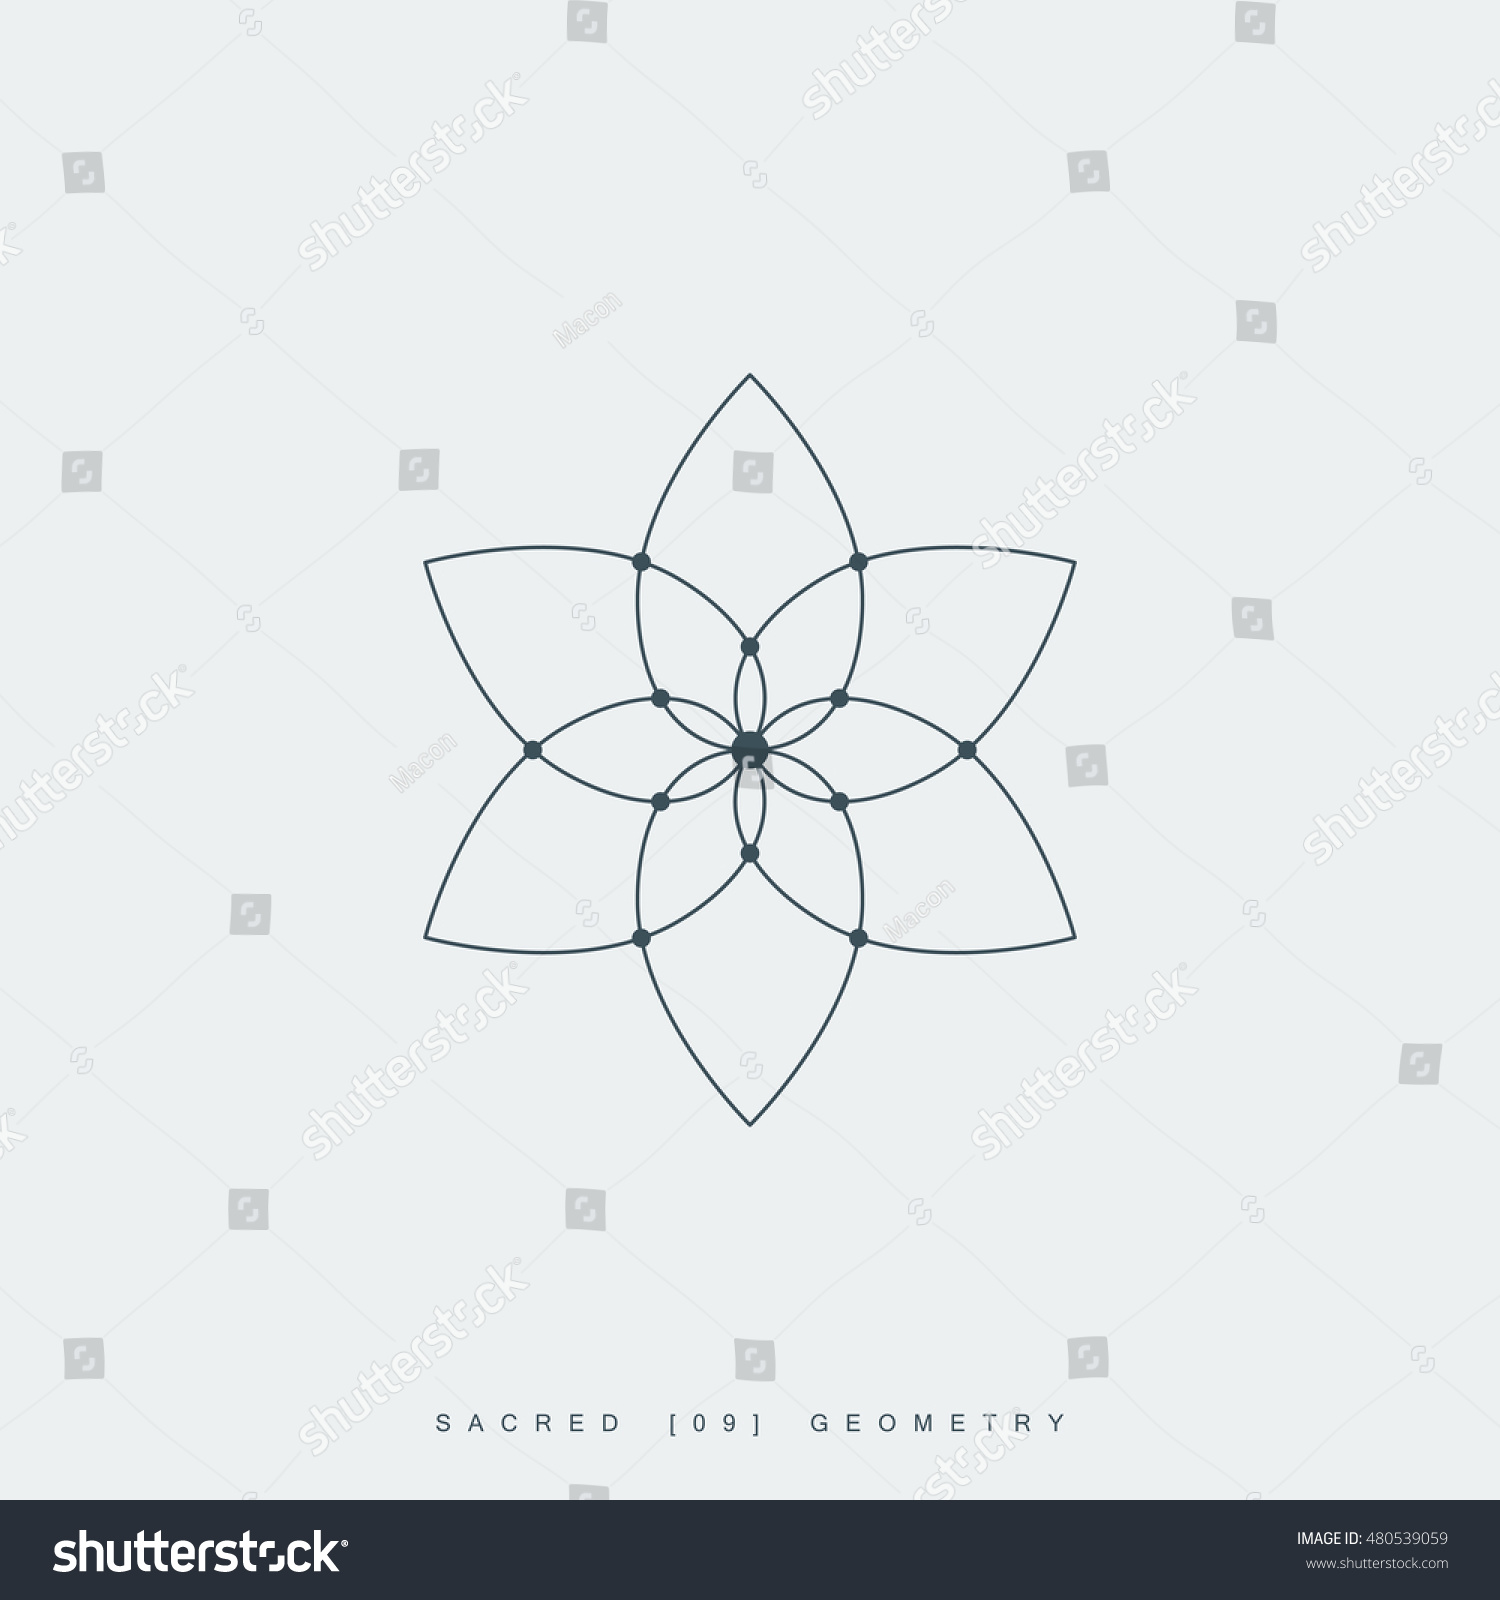 Flower life sacred geometry lotus flower stock vector 2018 flower of life sacred geometry lotus flower mandala ornament esoteric or spiritual izmirmasajfo Gallery